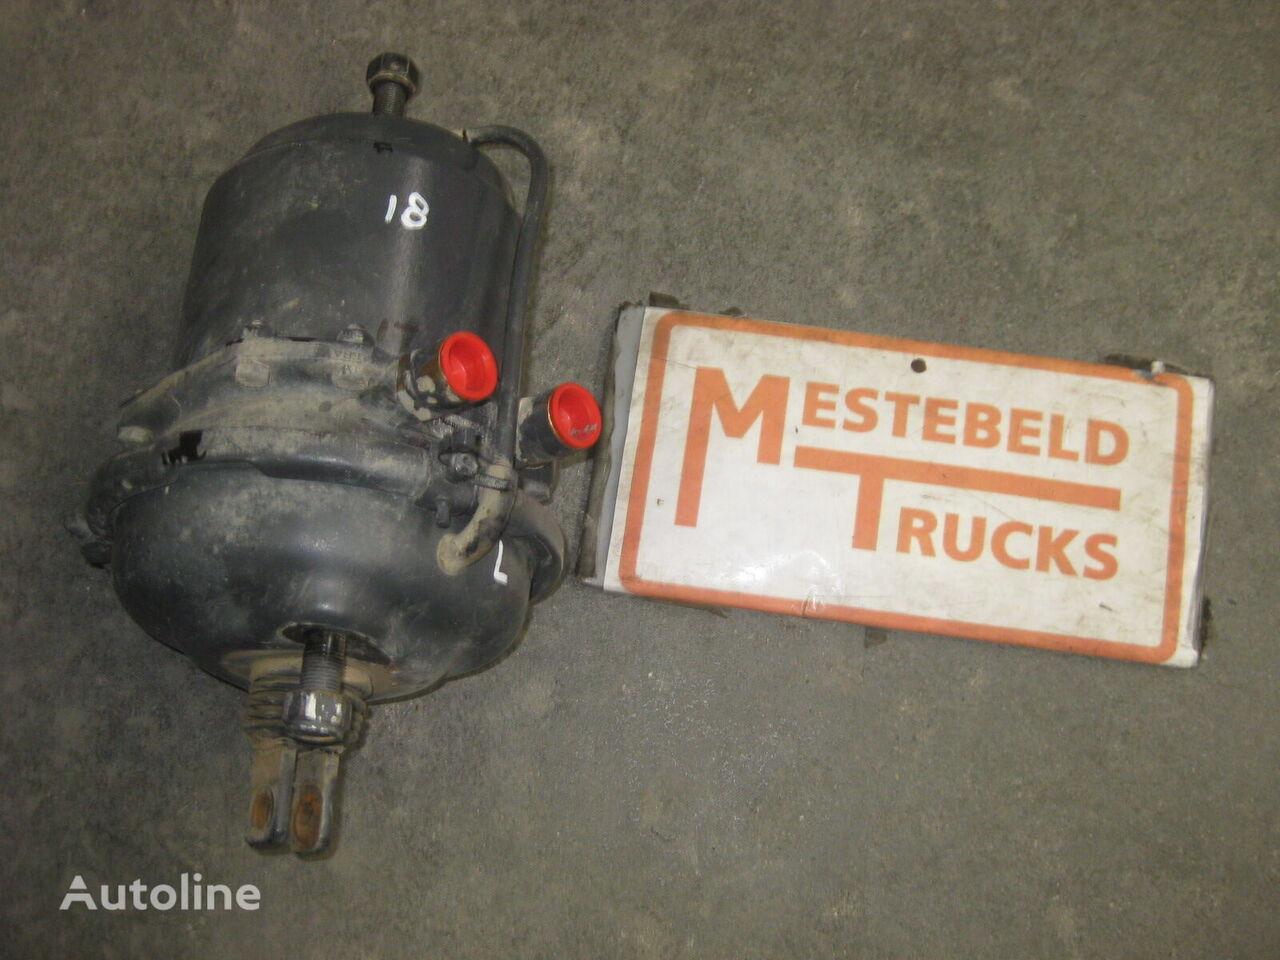 MERCEDES-BENZ Rembooster brake drum for MERCEDES-BENZ Actros/Axor truck